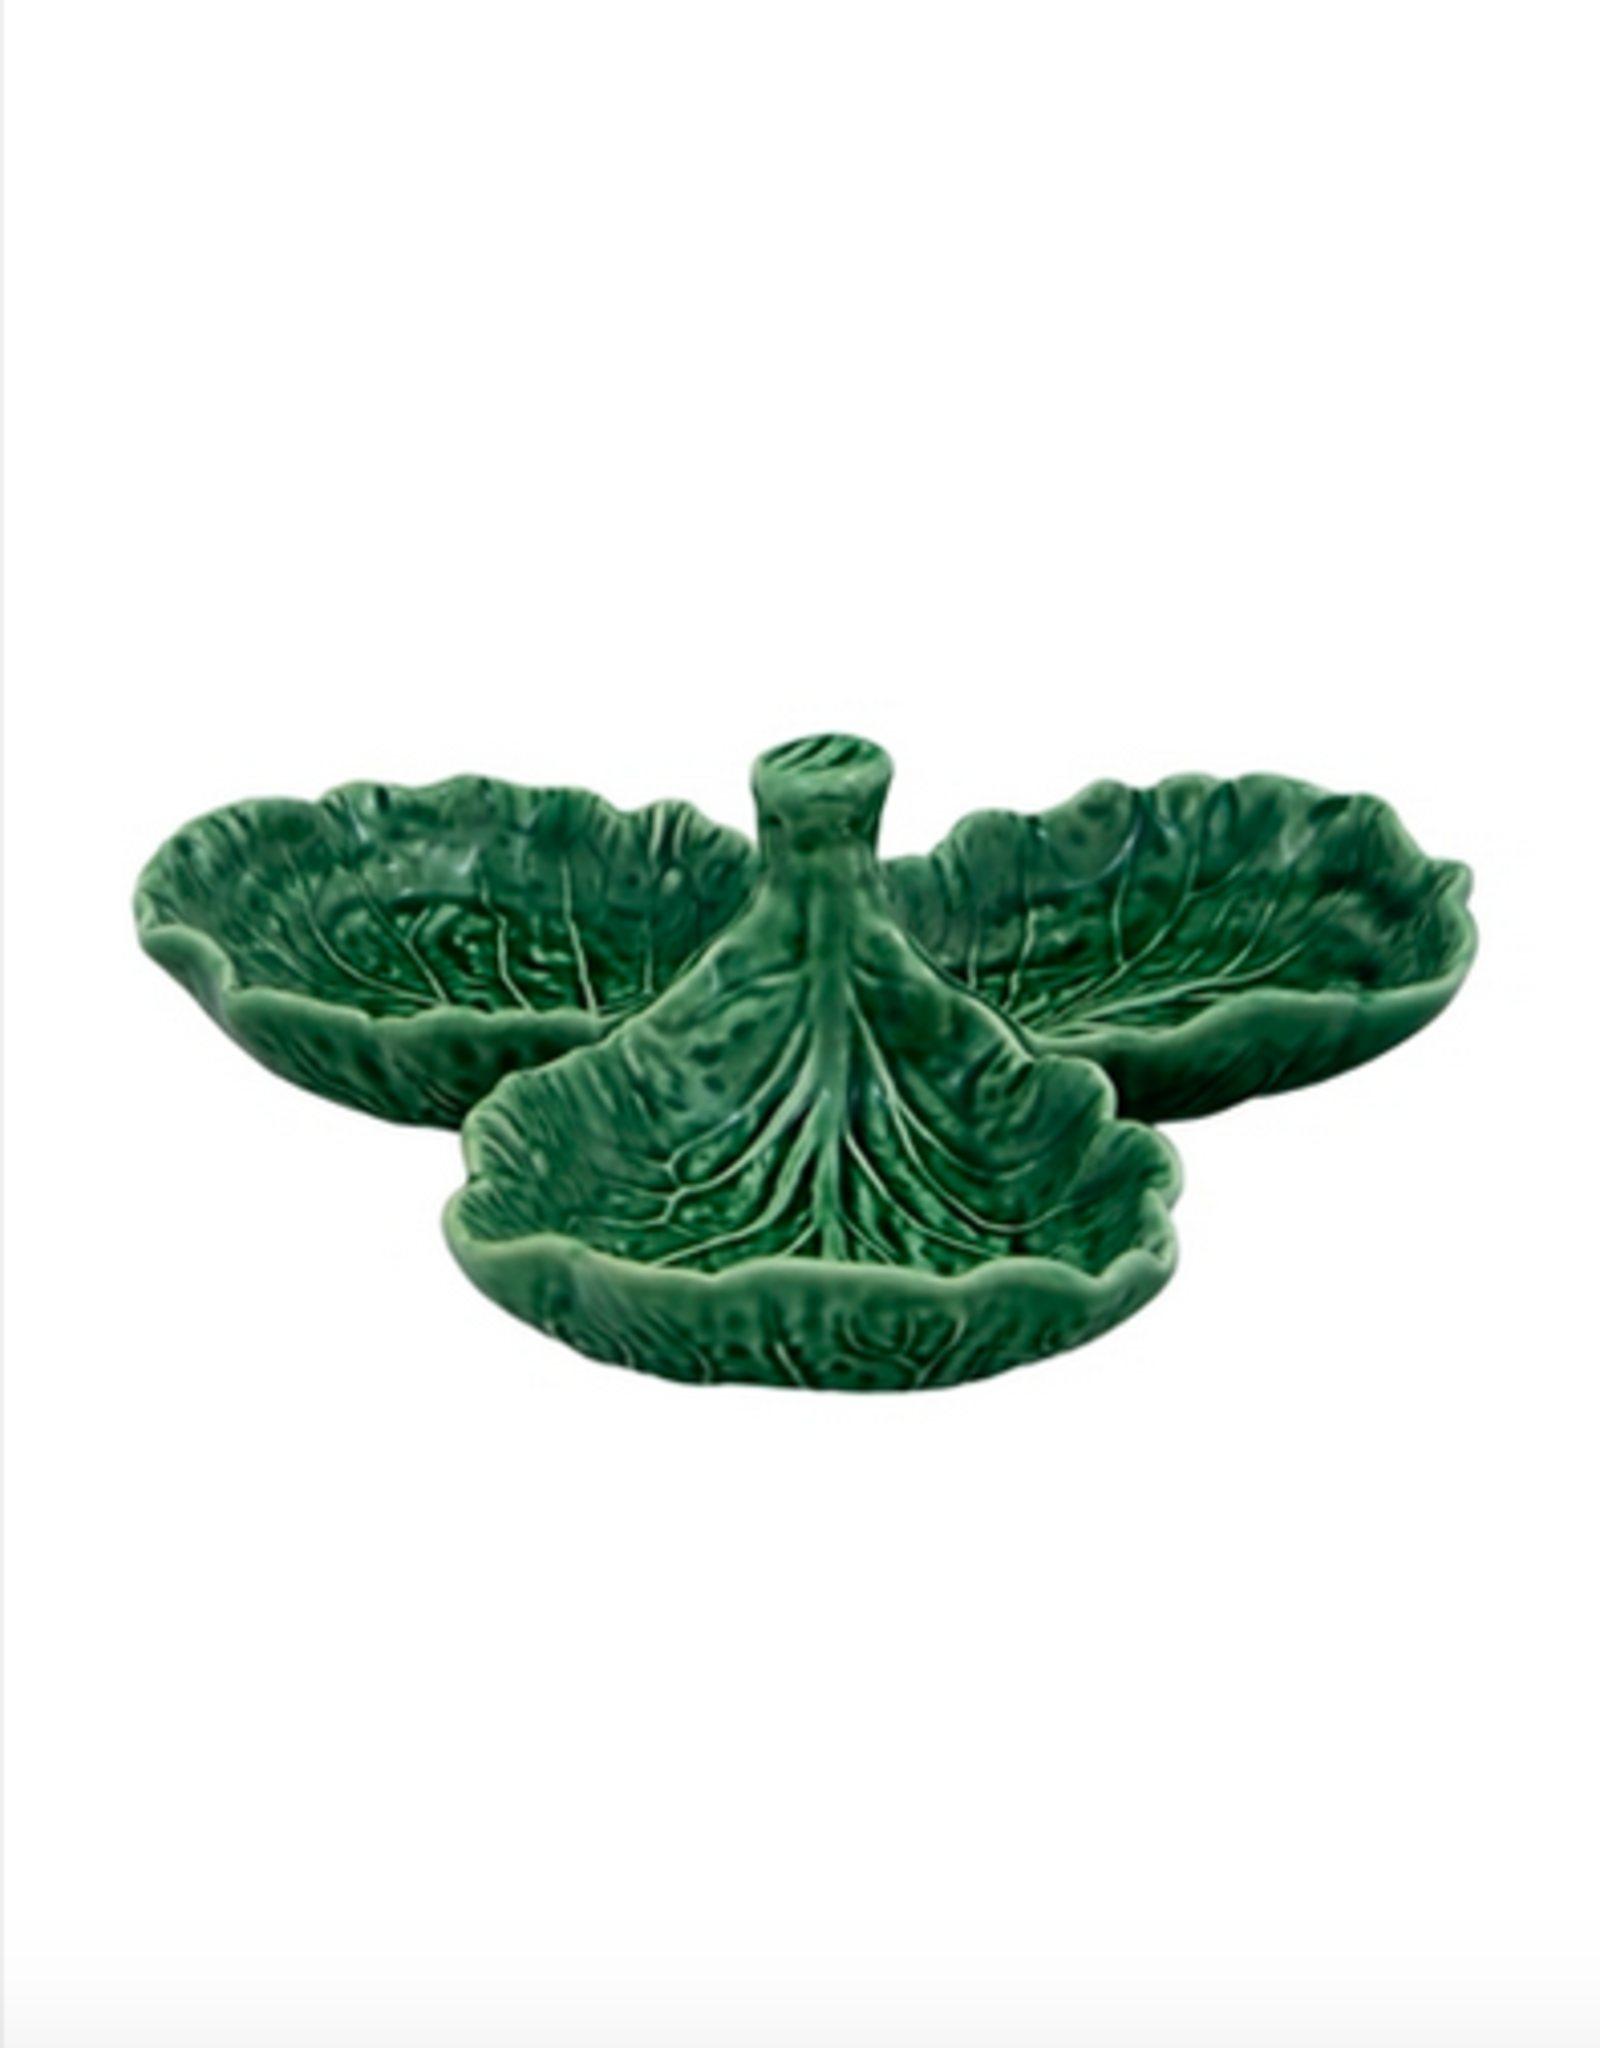 Bordalo Pinheiro Olive dish cabbage